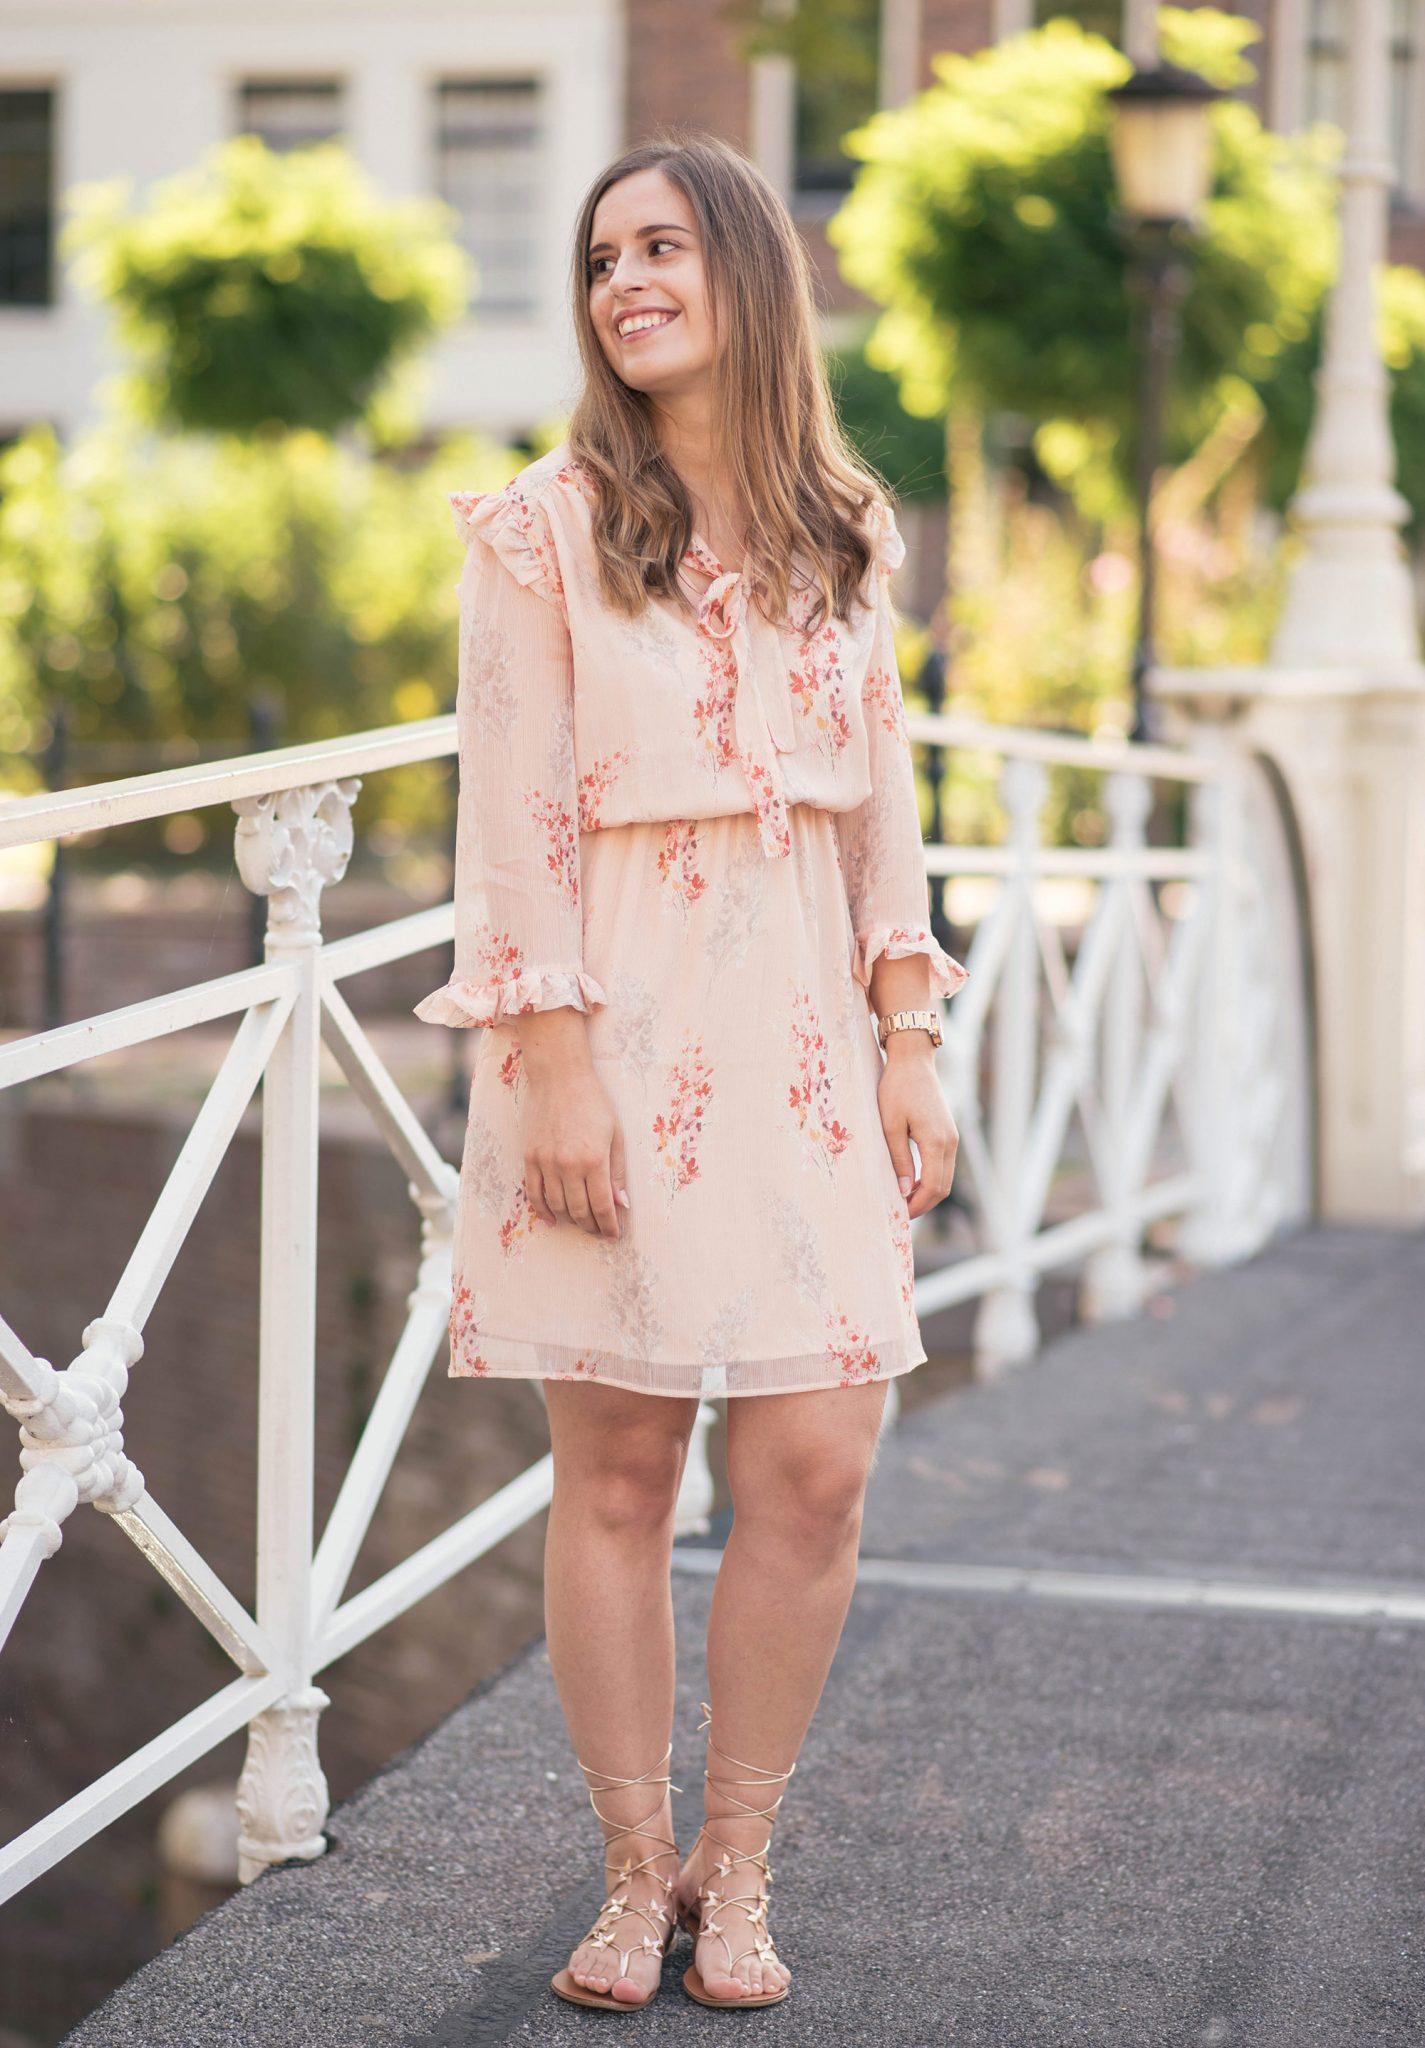 blush-floral-dress-thepetitecat-outfit